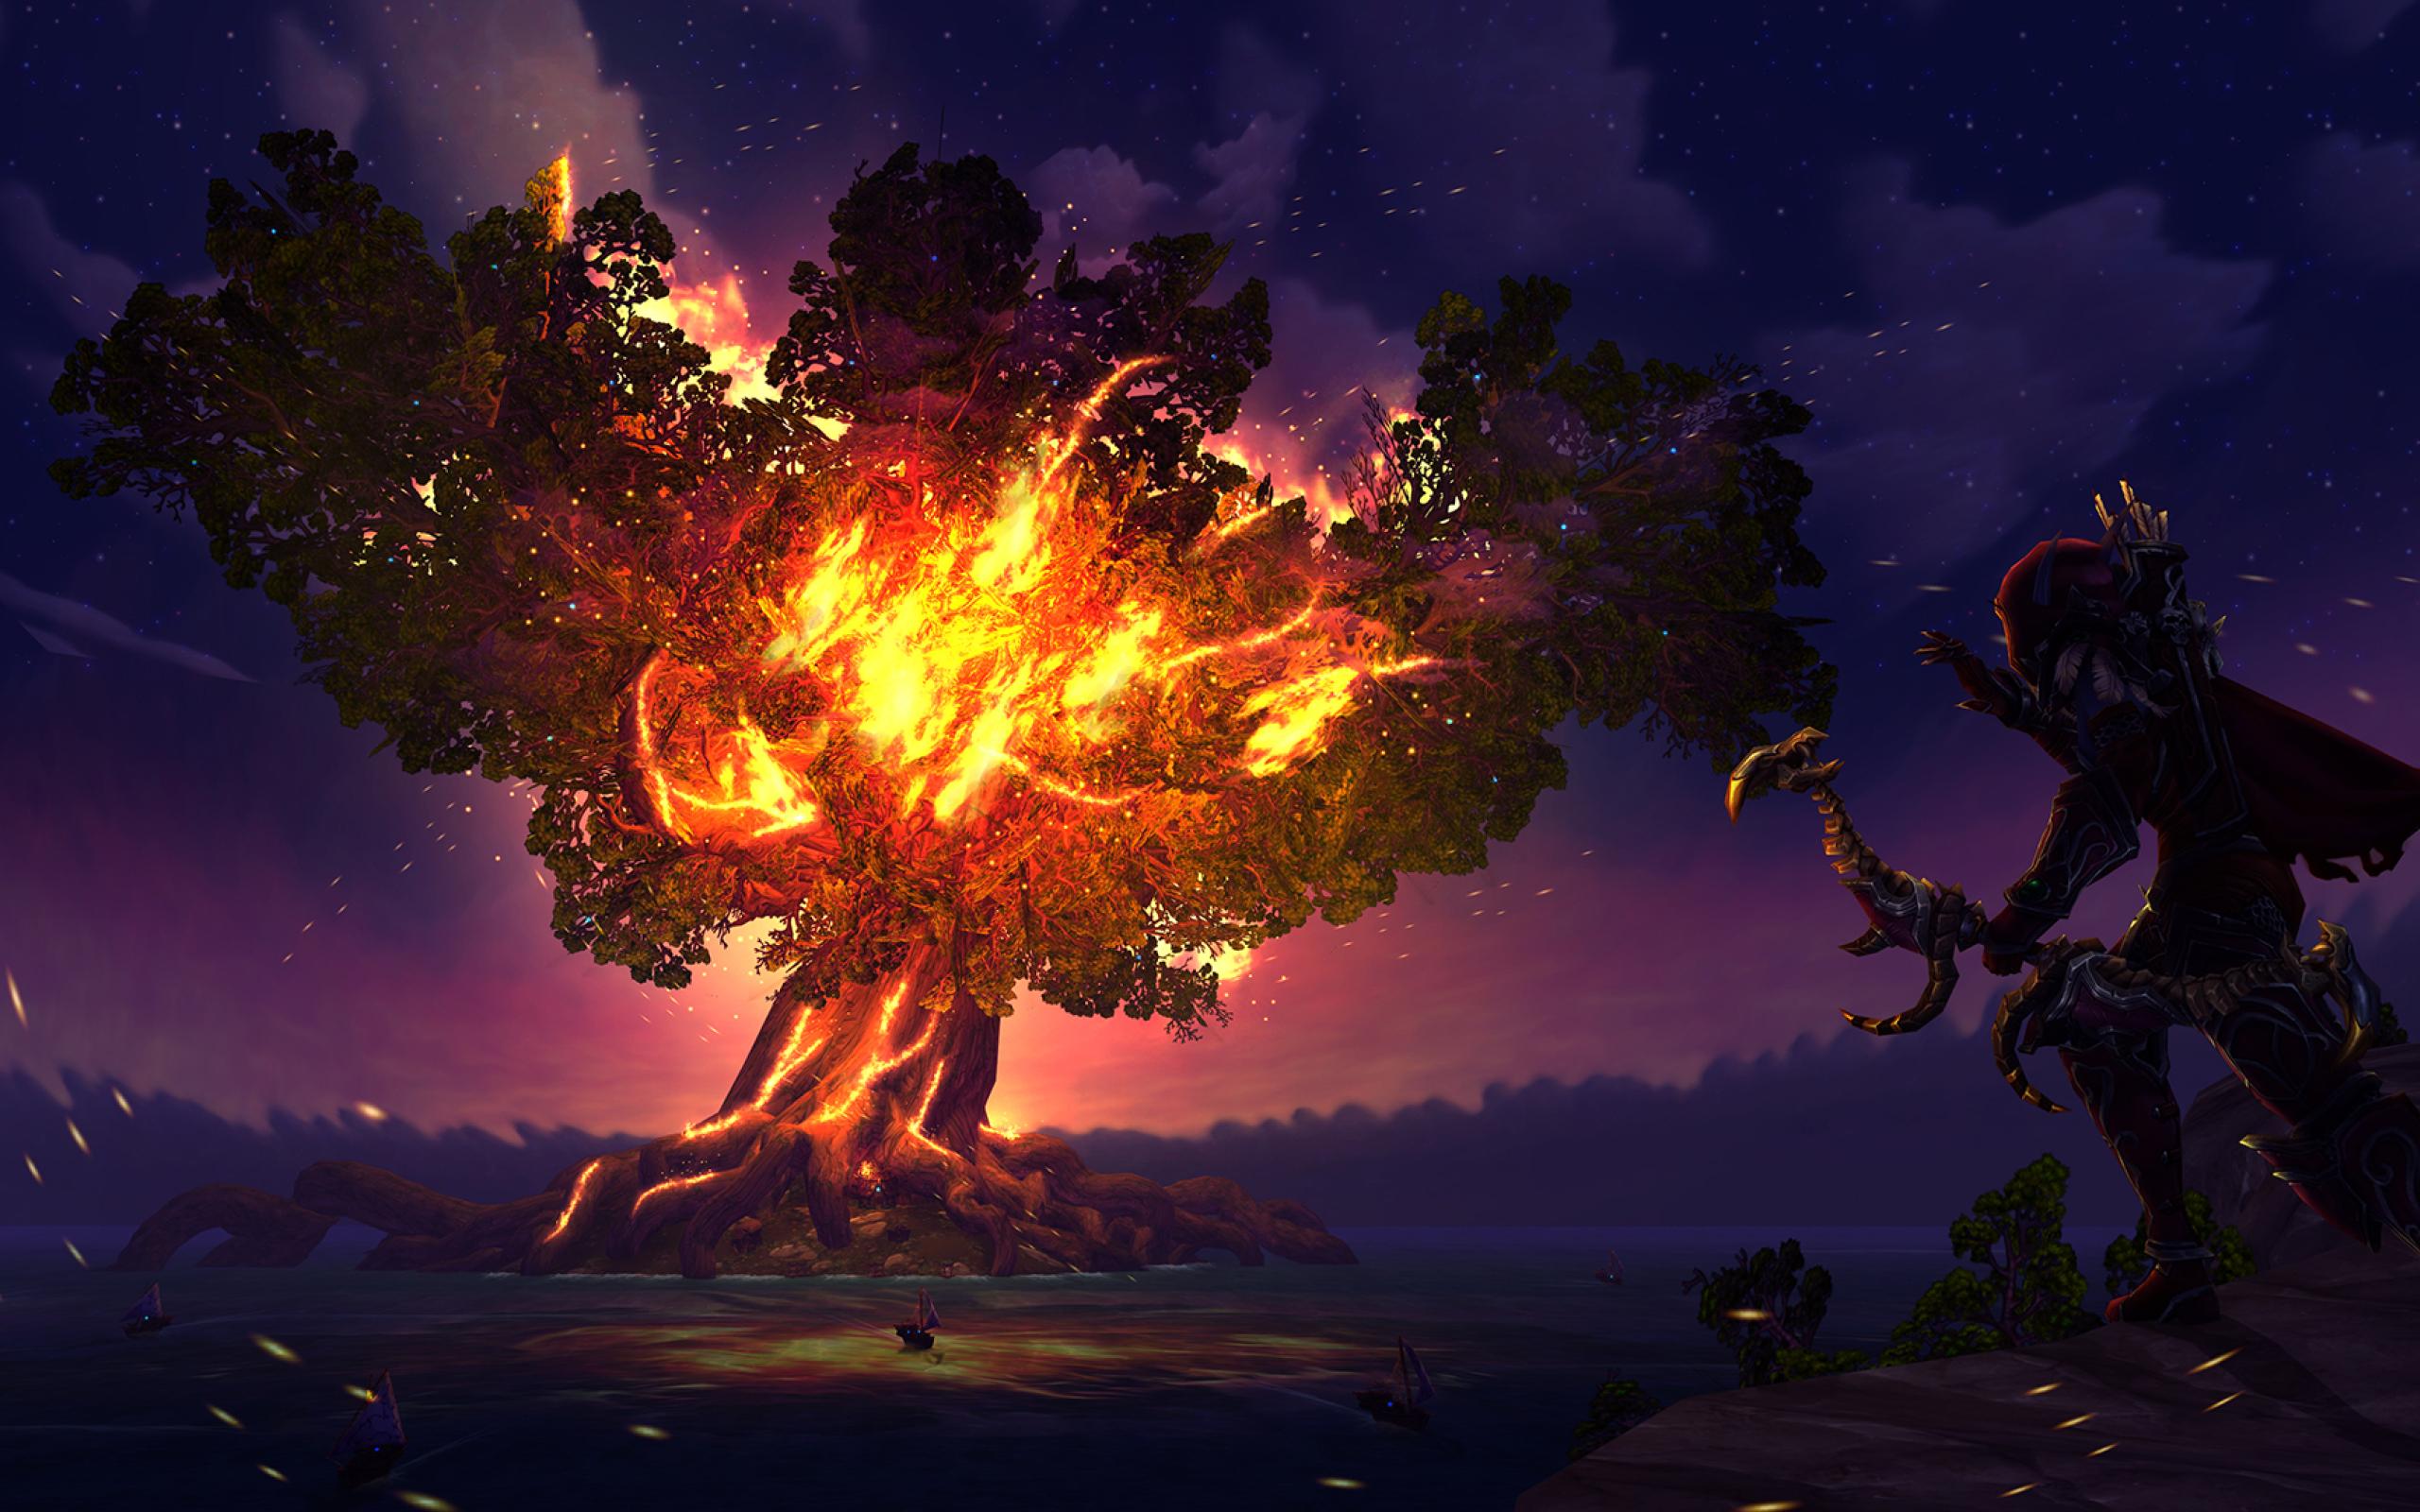 Sylvanas windrunner fire tree world of warcraft full hd wallpaper - Sylvanas windrunner wallpaper ...